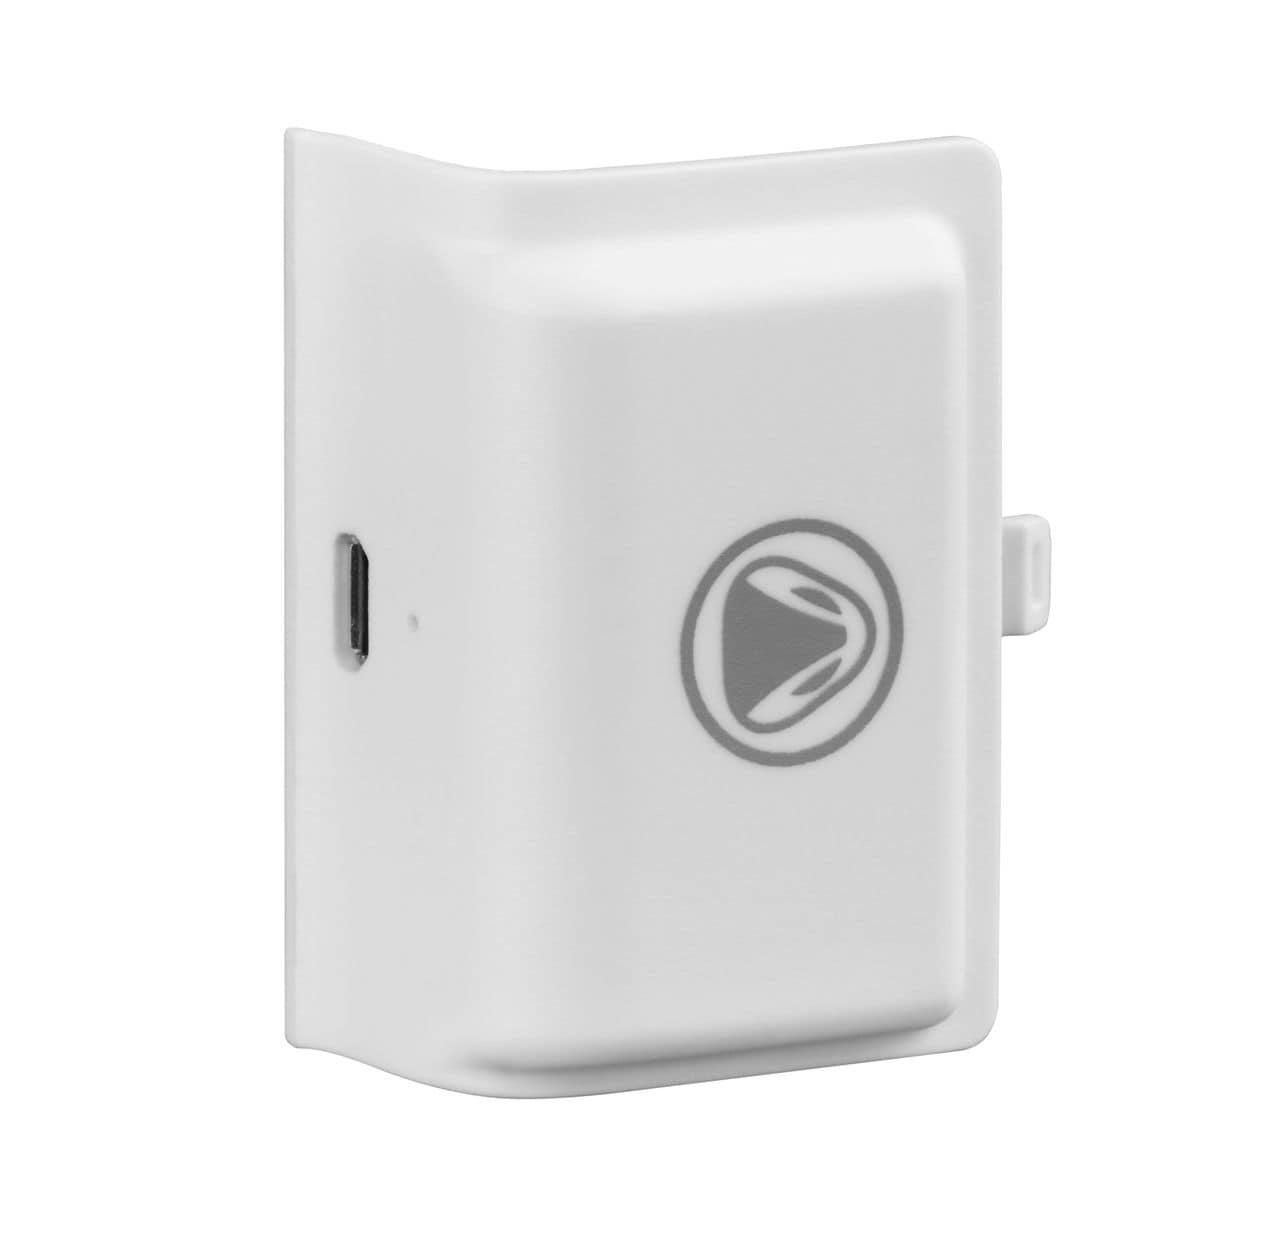 snakebyte akumulator do kontrolera XBOX ONE 1500 mAh biały BATTERY:KIT PRO - 1